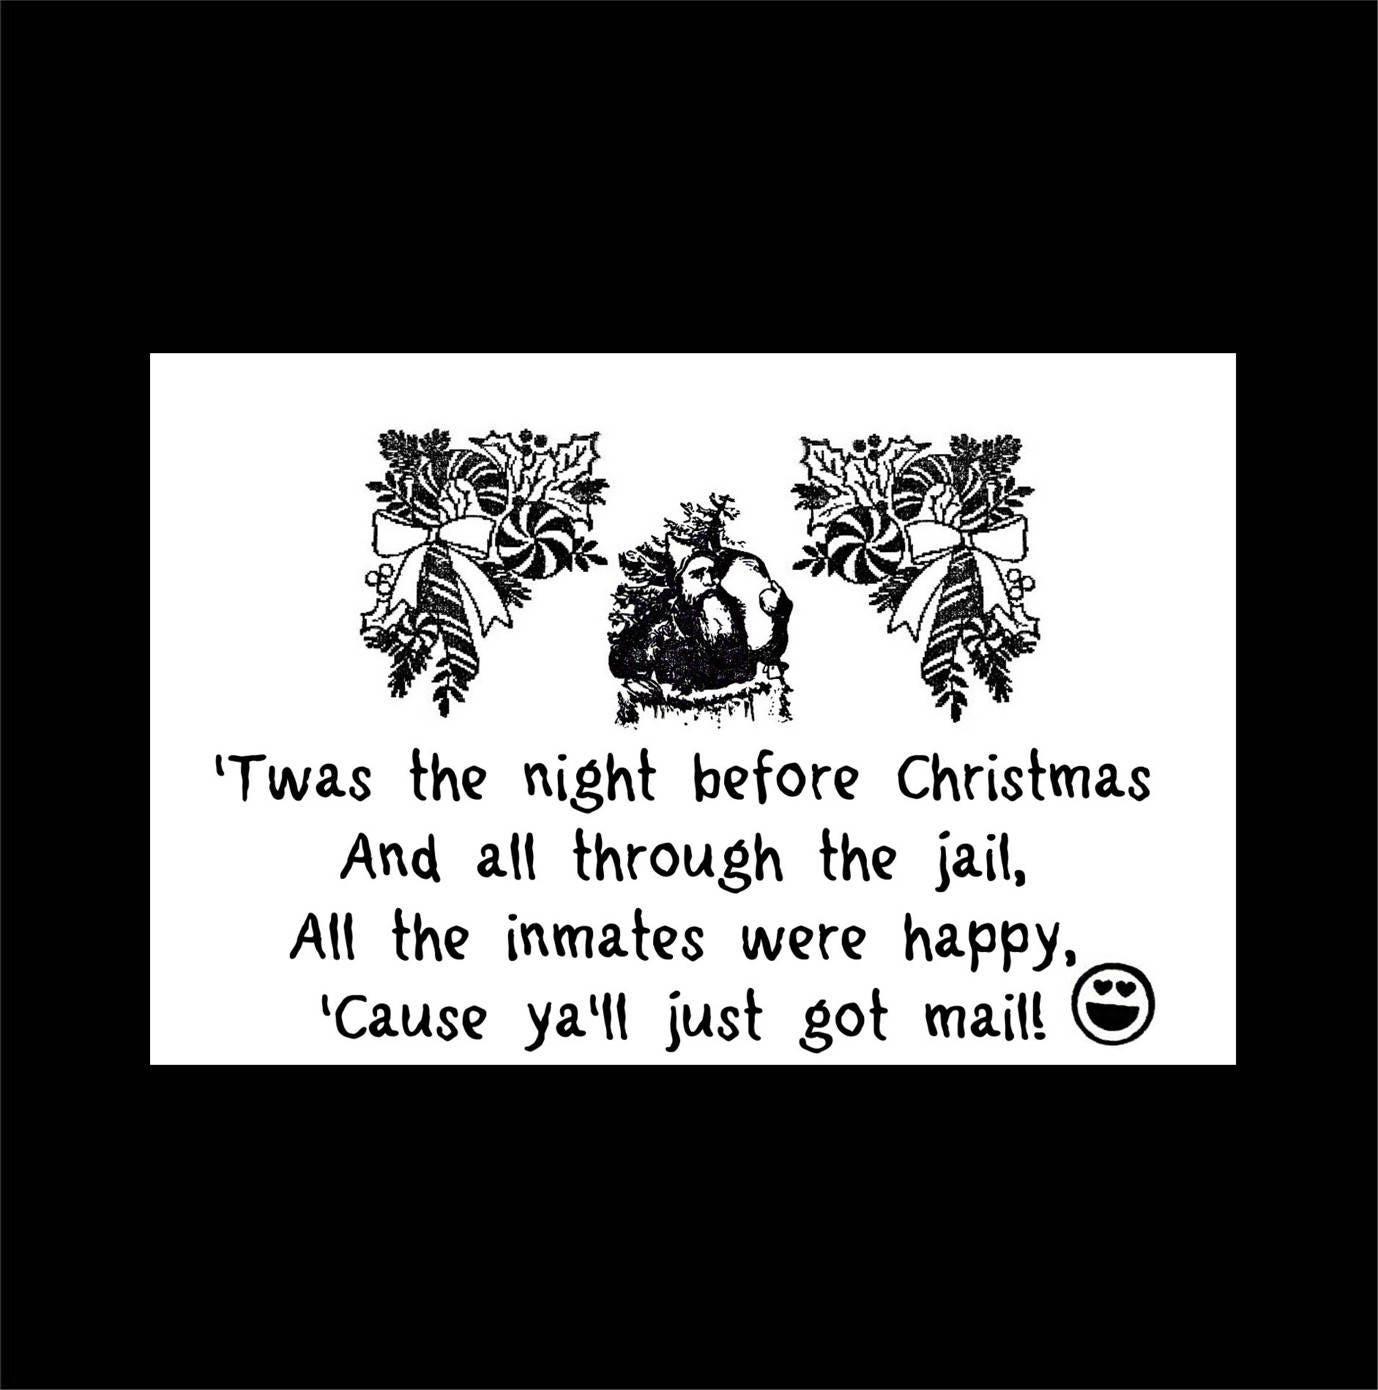 Inmate Christmas Prison Christmas Prison Greeting Card Etsy